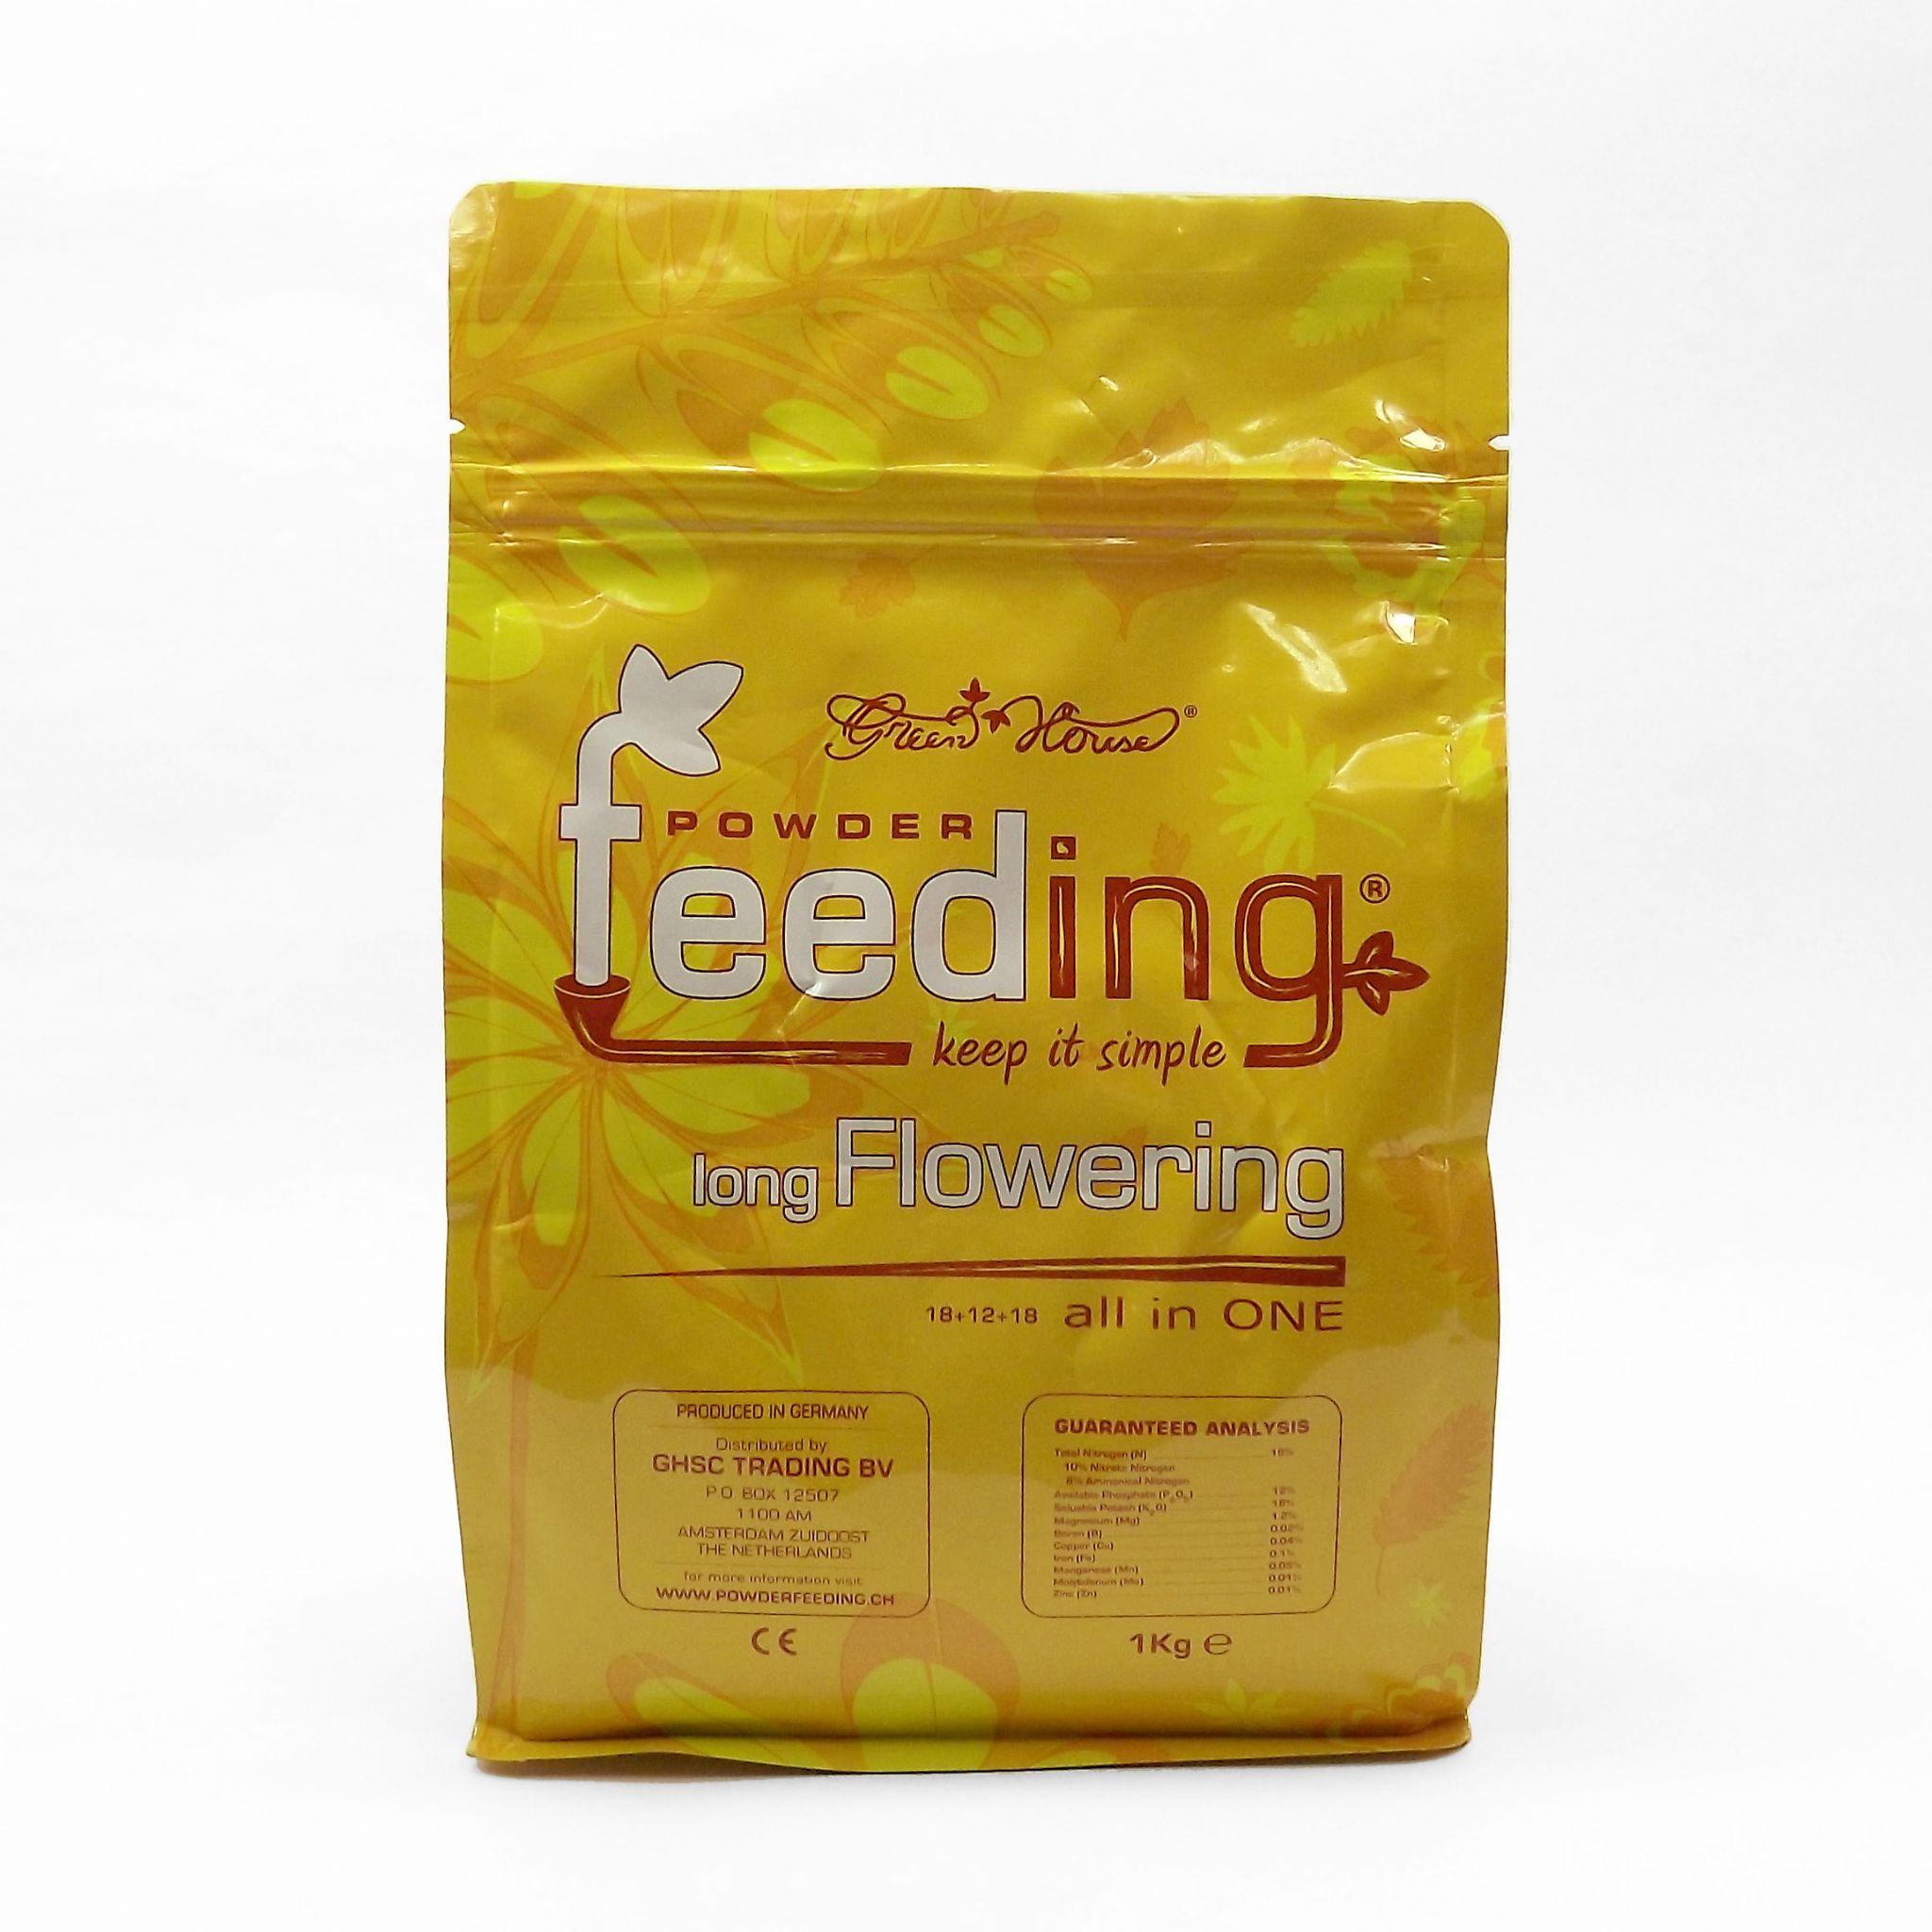 Green House Pwder Feeding Long Flowering 1kg